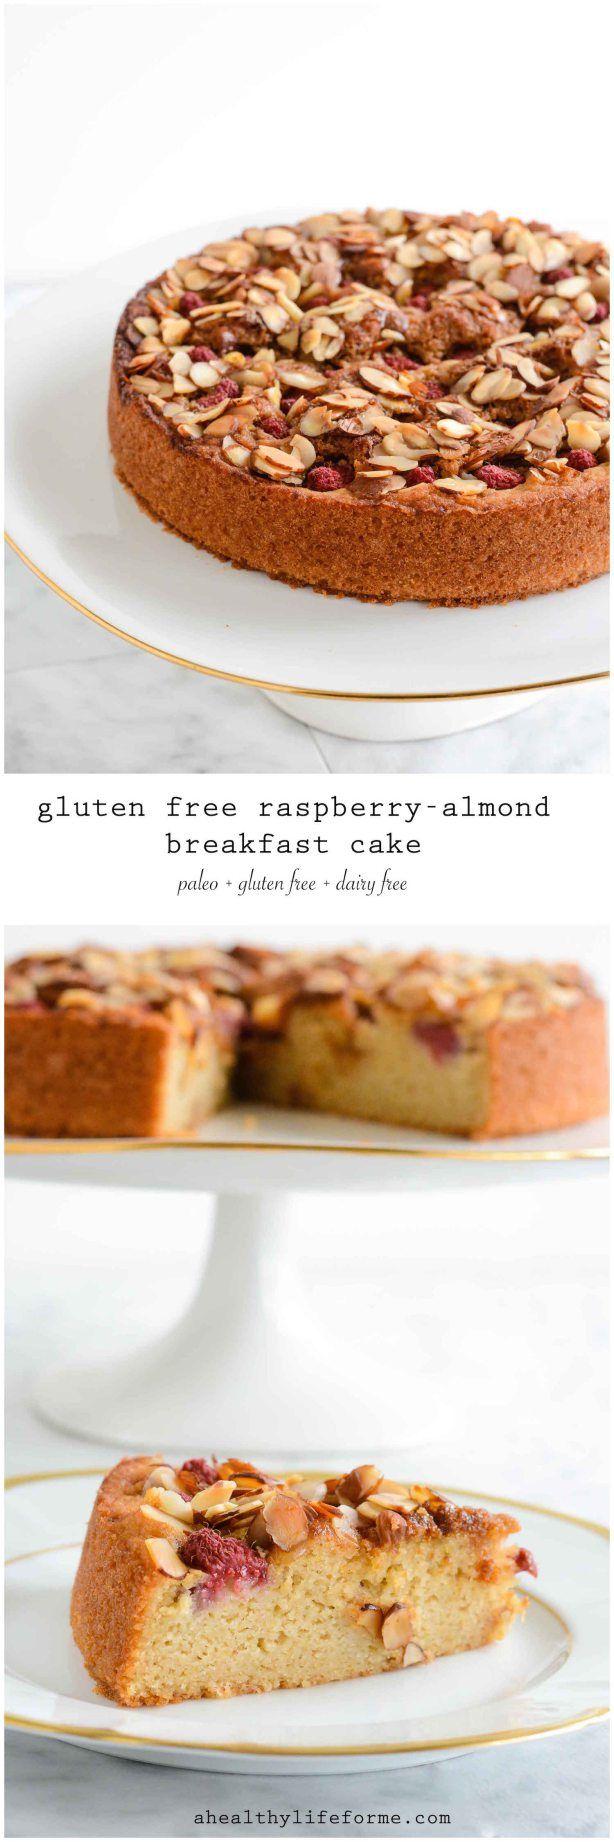 Gluten Free Raspberry Almond Cake is Paleo Dairy Free Delicious Recipe   ahealthylifeforme.com